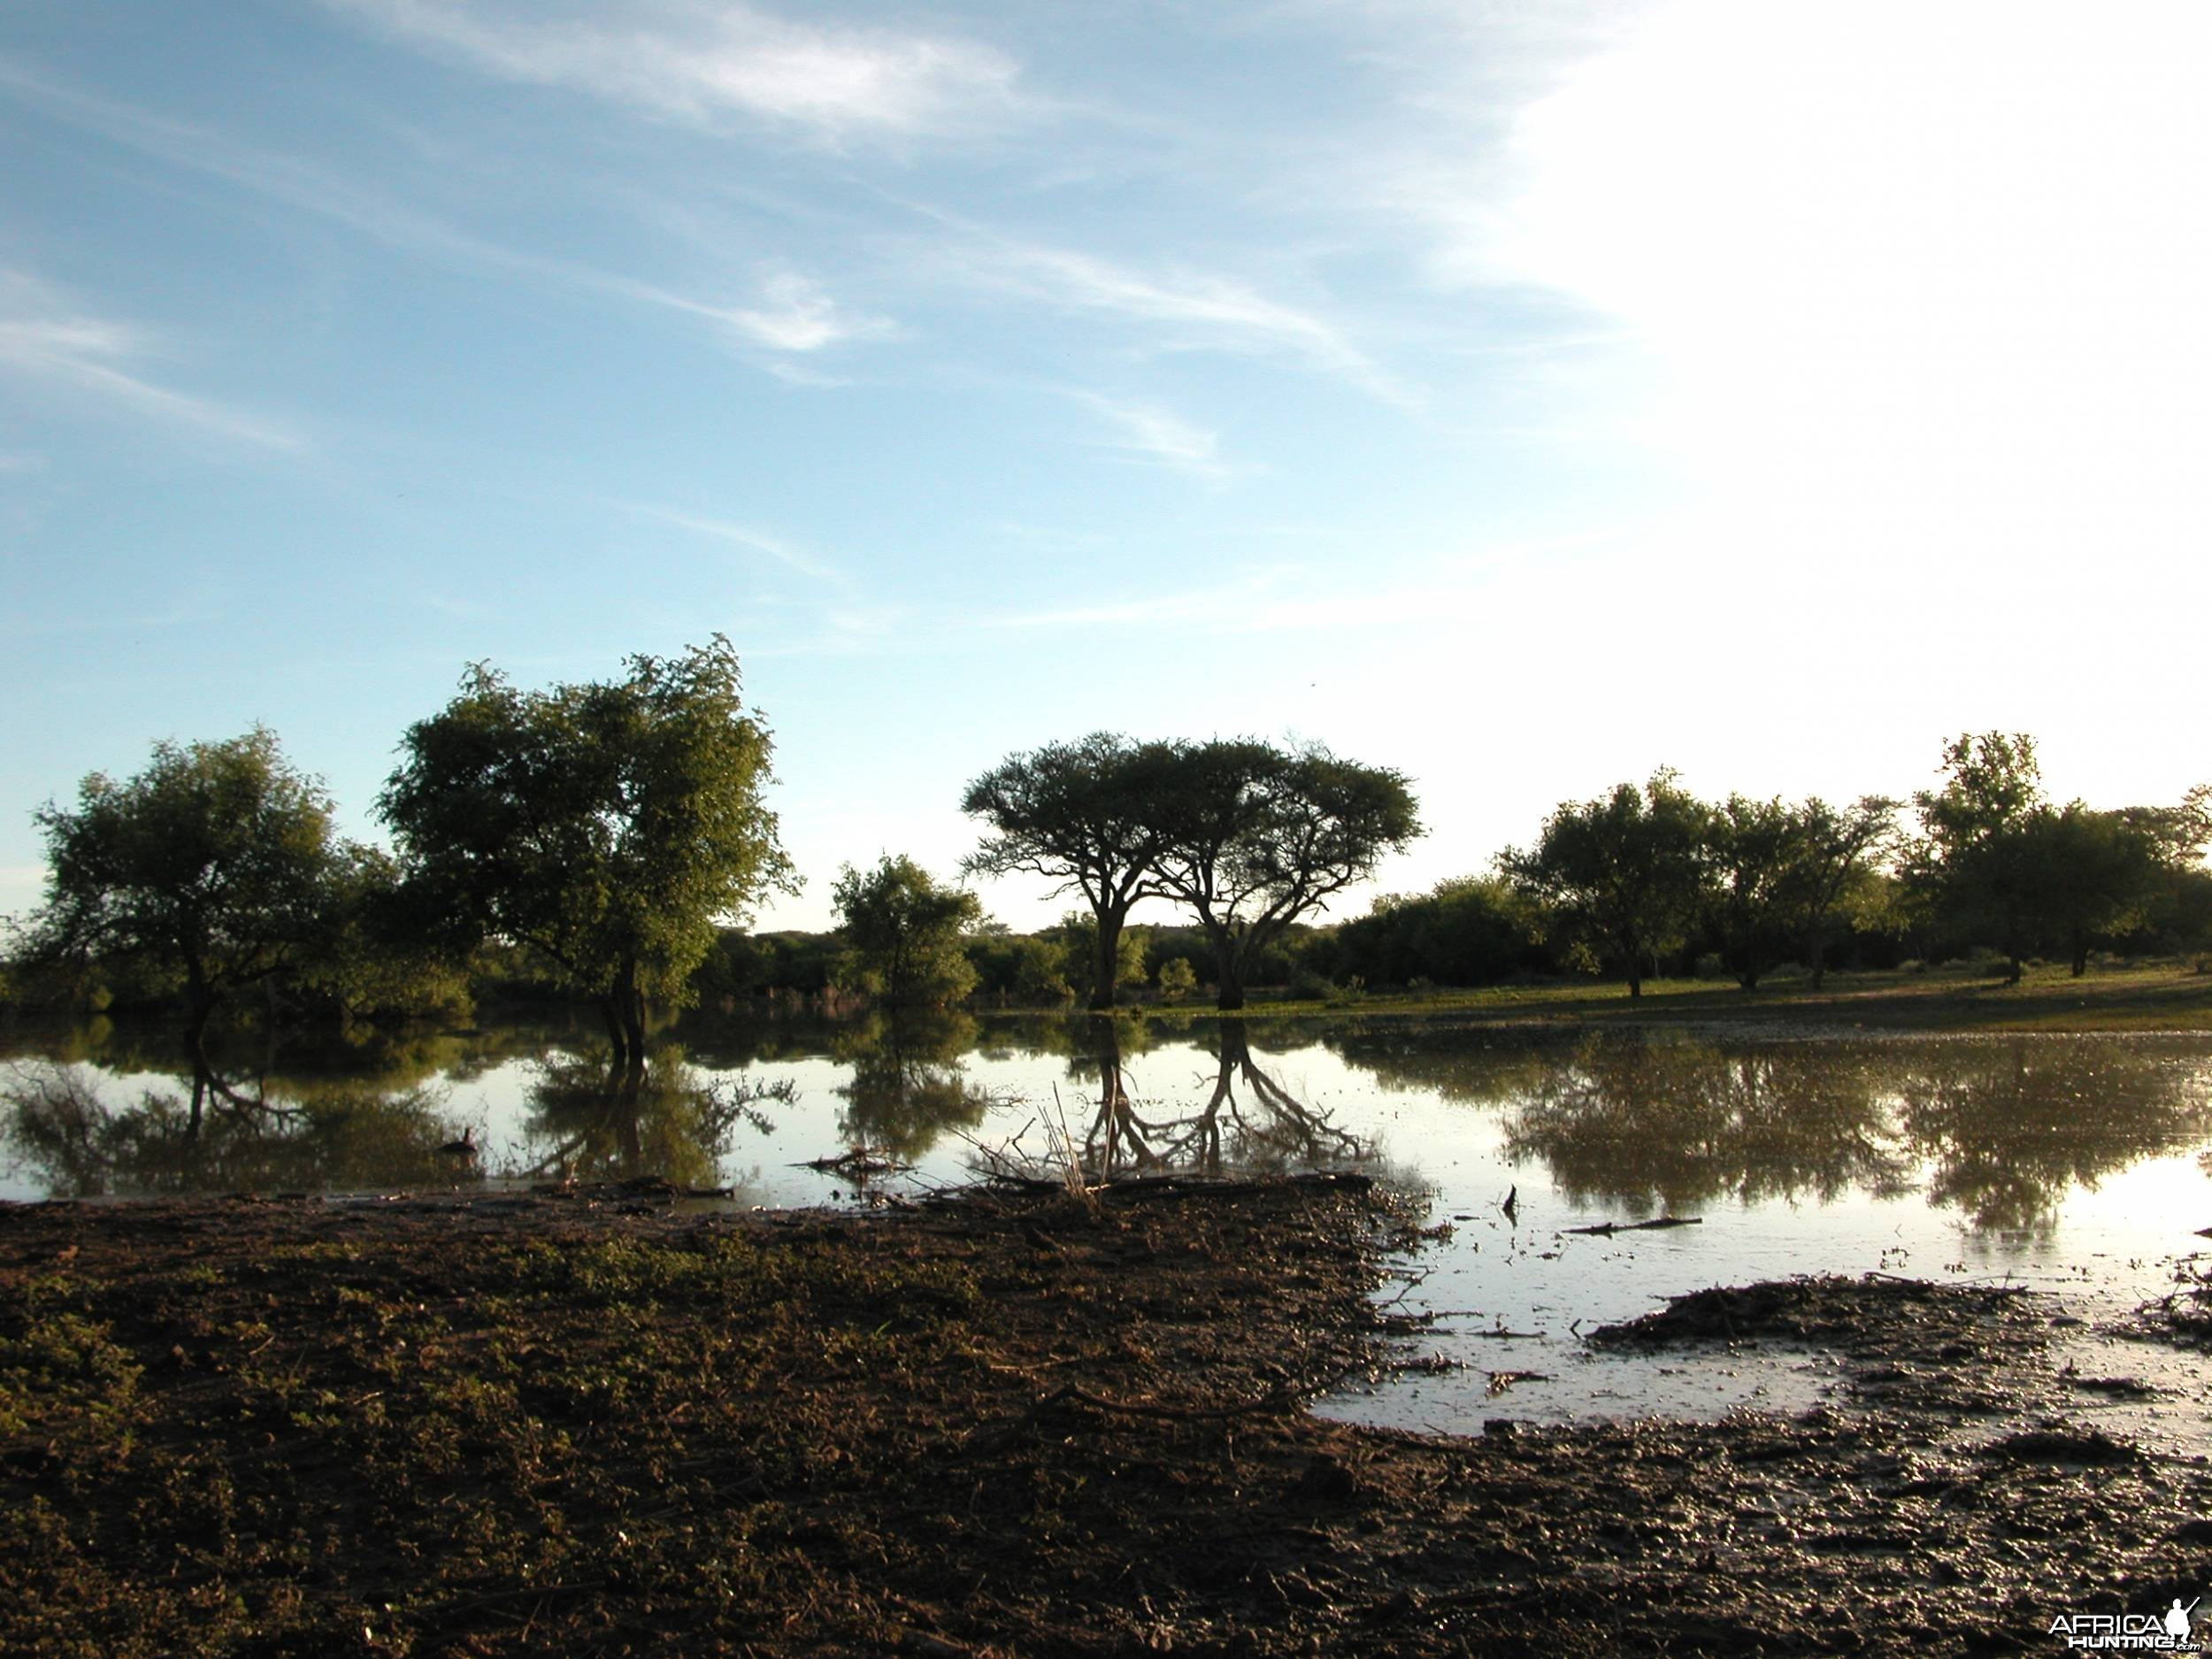 Africa Namibia Waterhole Raining Season